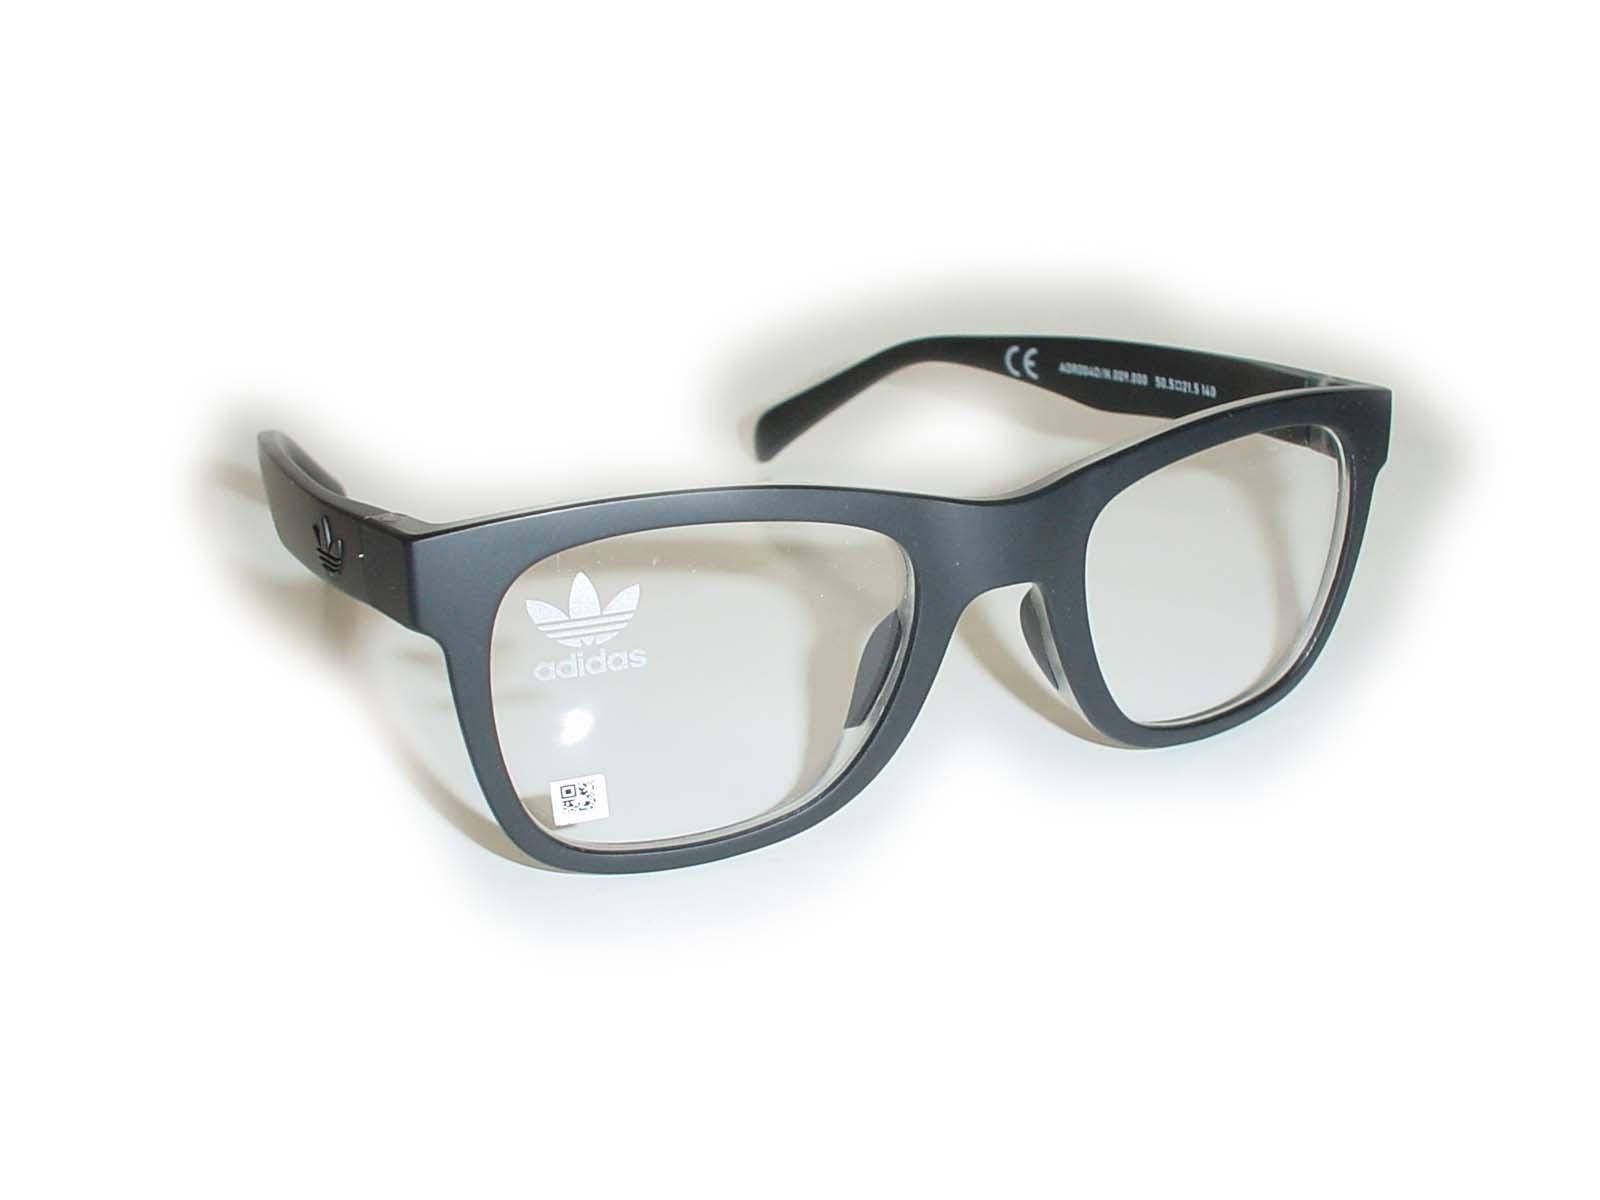 ★adidas(アディス)★AOR0040/N50.5□21.5-140COL.009.000ブラック超薄型非球面レンズ付